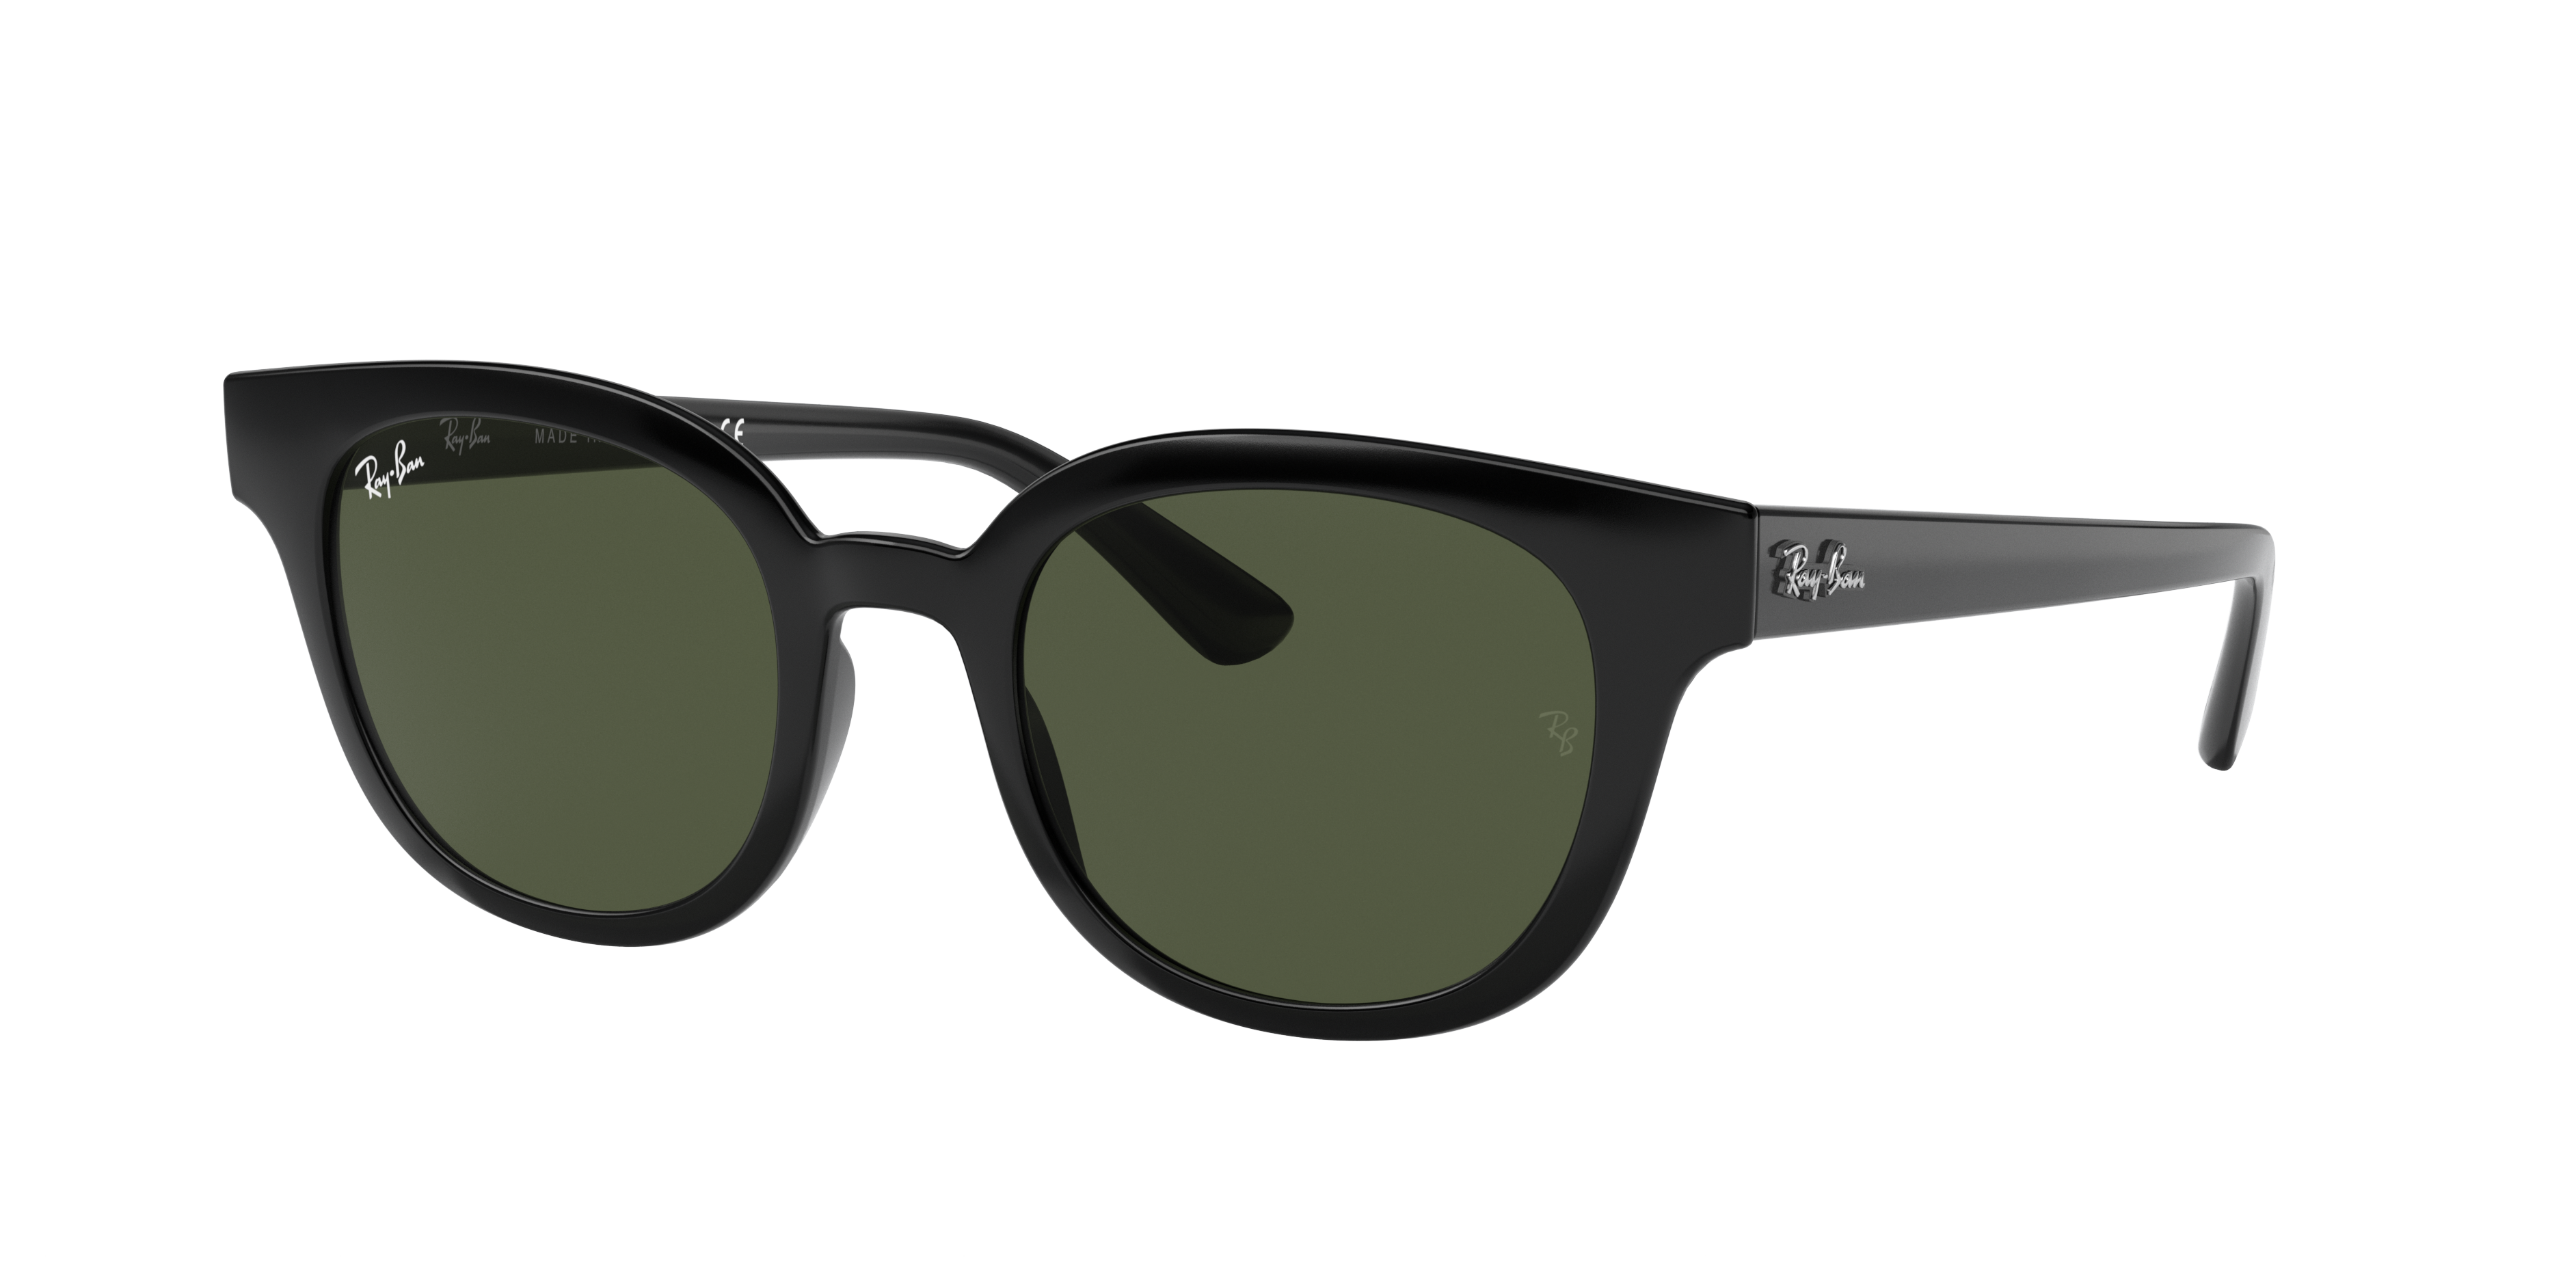 Ray-Ban Rb4324 Black, Green Lenses - RB4324